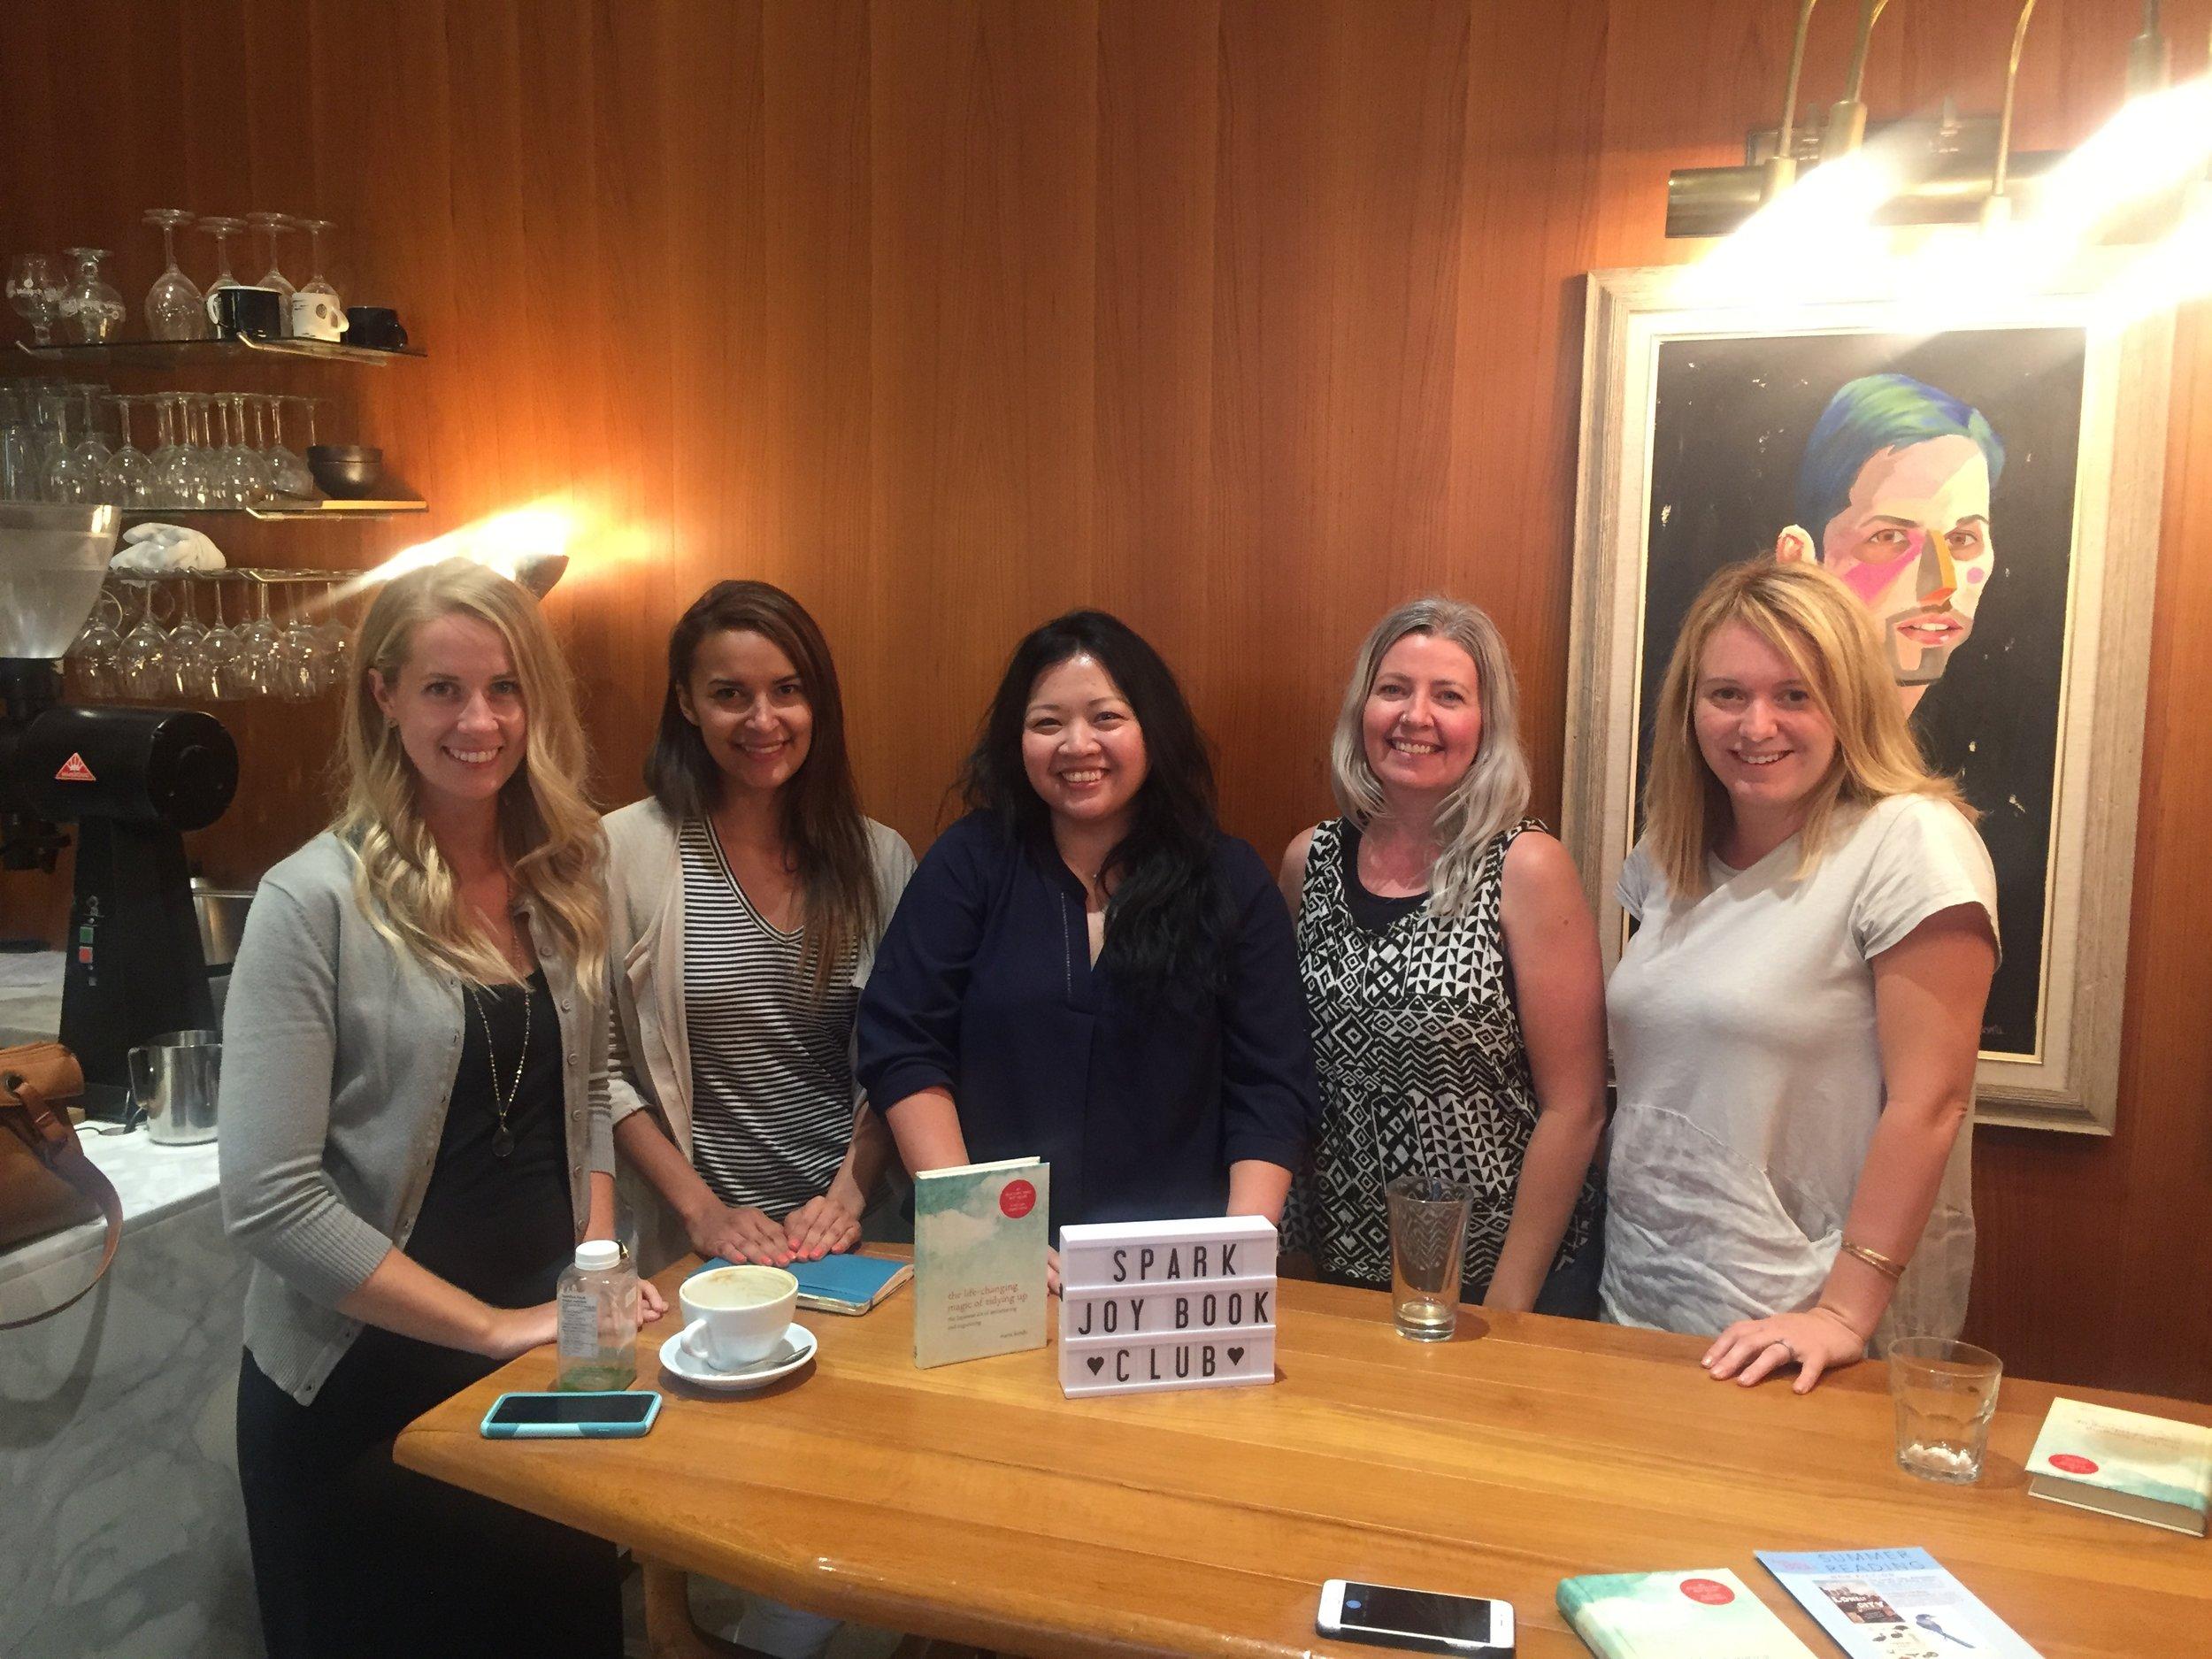 Spark Joy Book Club August 2017 Meeting at Phil & Sebastians Coffee Roasters - Mission